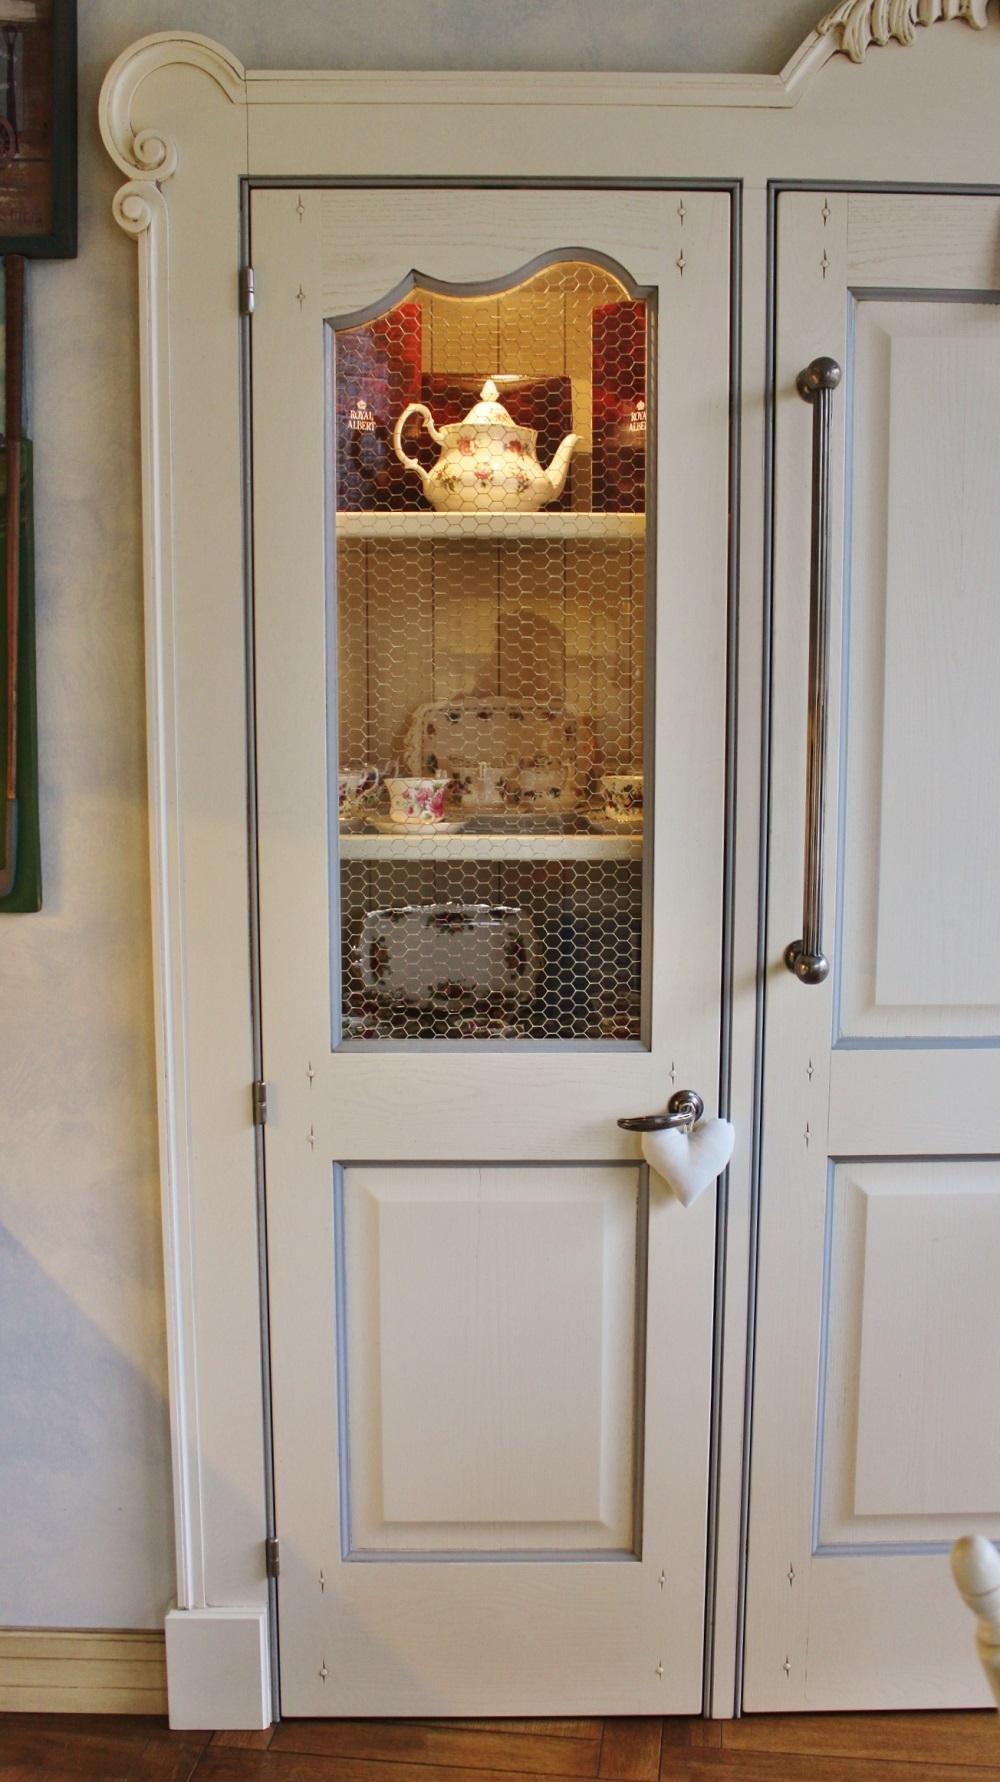 Lampadari led cucina - Cucina con dispensa angolare ...